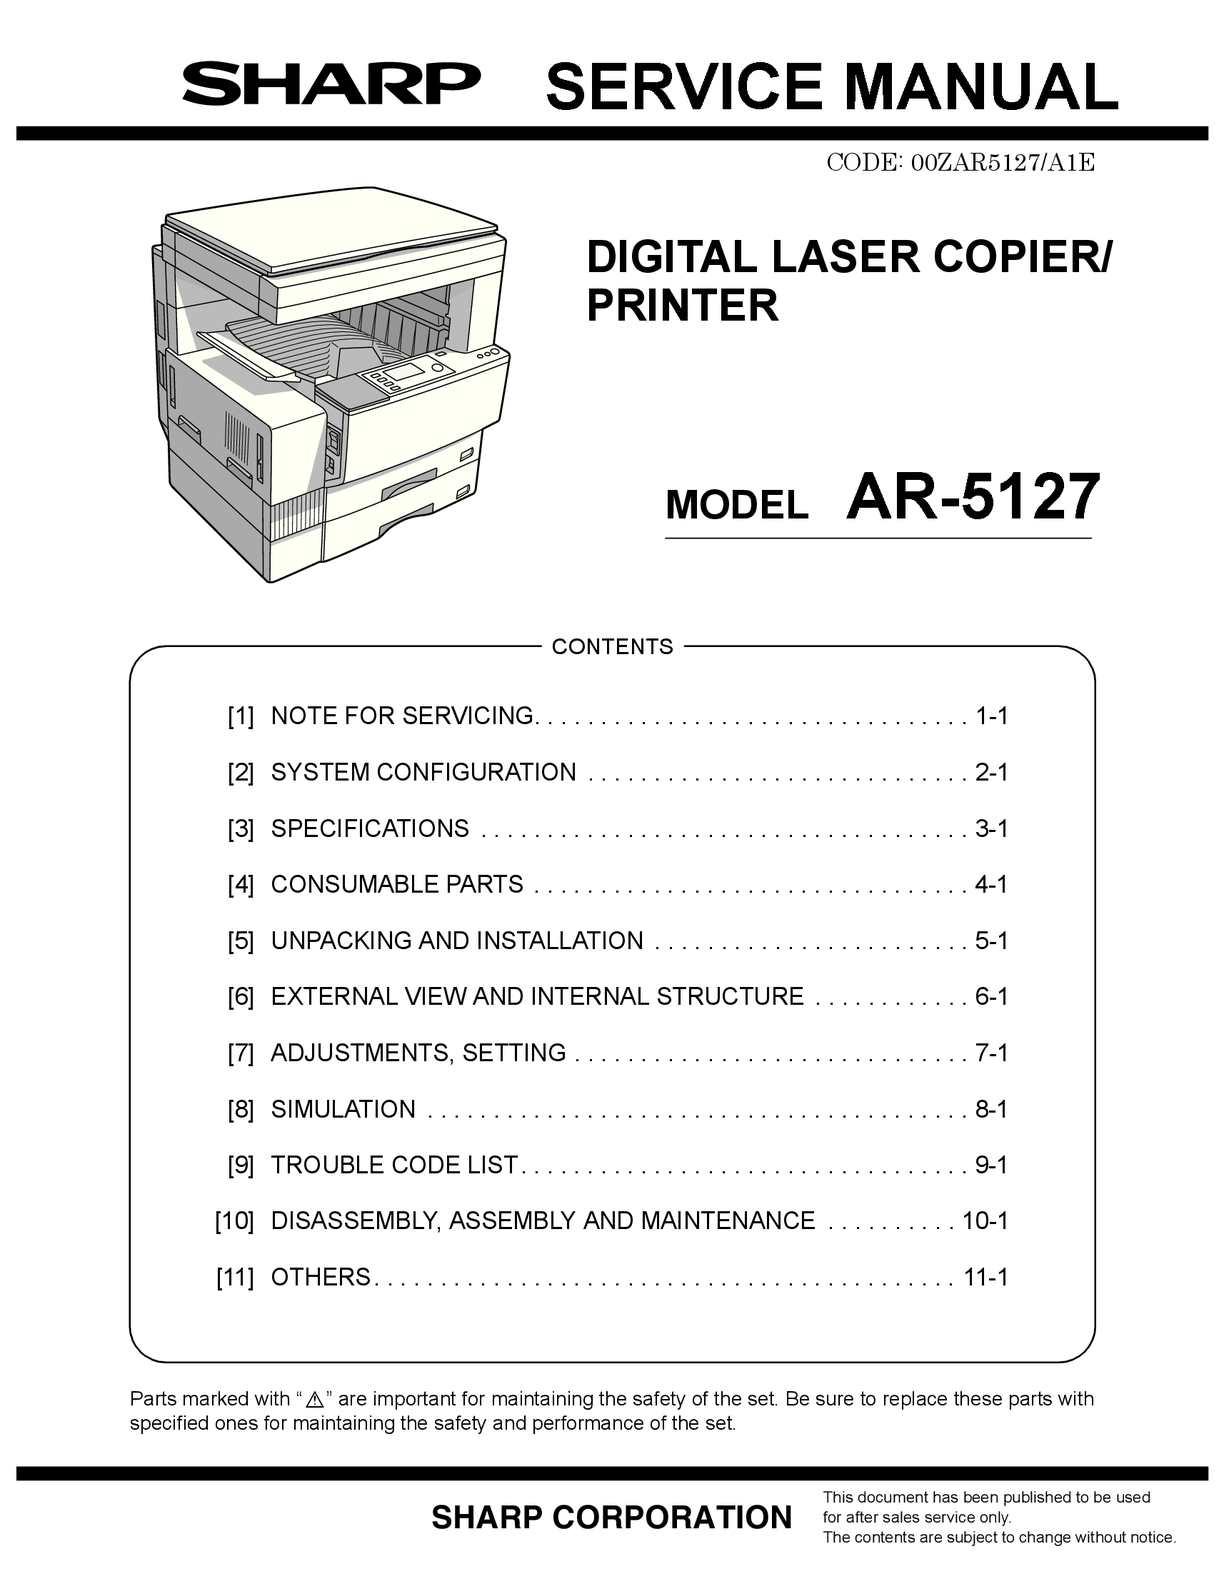 Calamo Service Manual Sharp Ar 5127 Sme Mt8870 Dtmf Telephone Dial Tone Decoder Circuit Diagram Nonstopfree